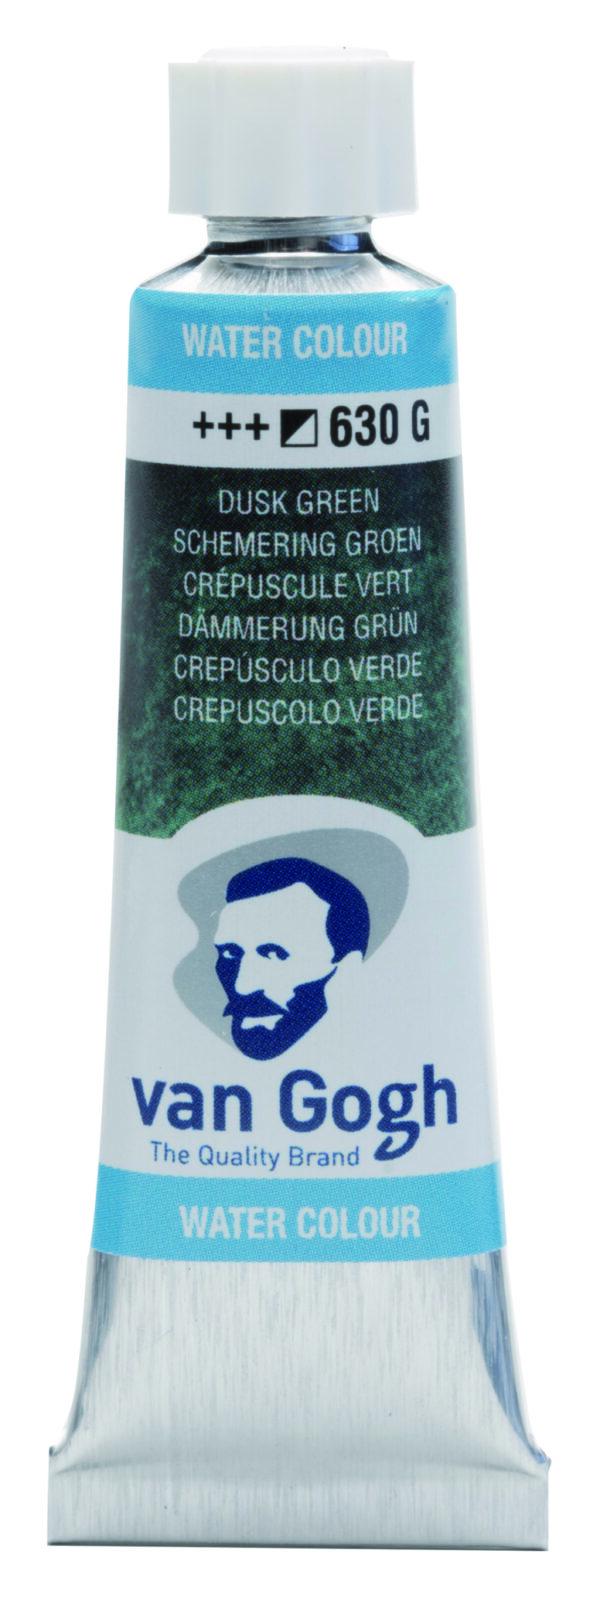 Van Gogh 630 Dusk Green- 10 ml